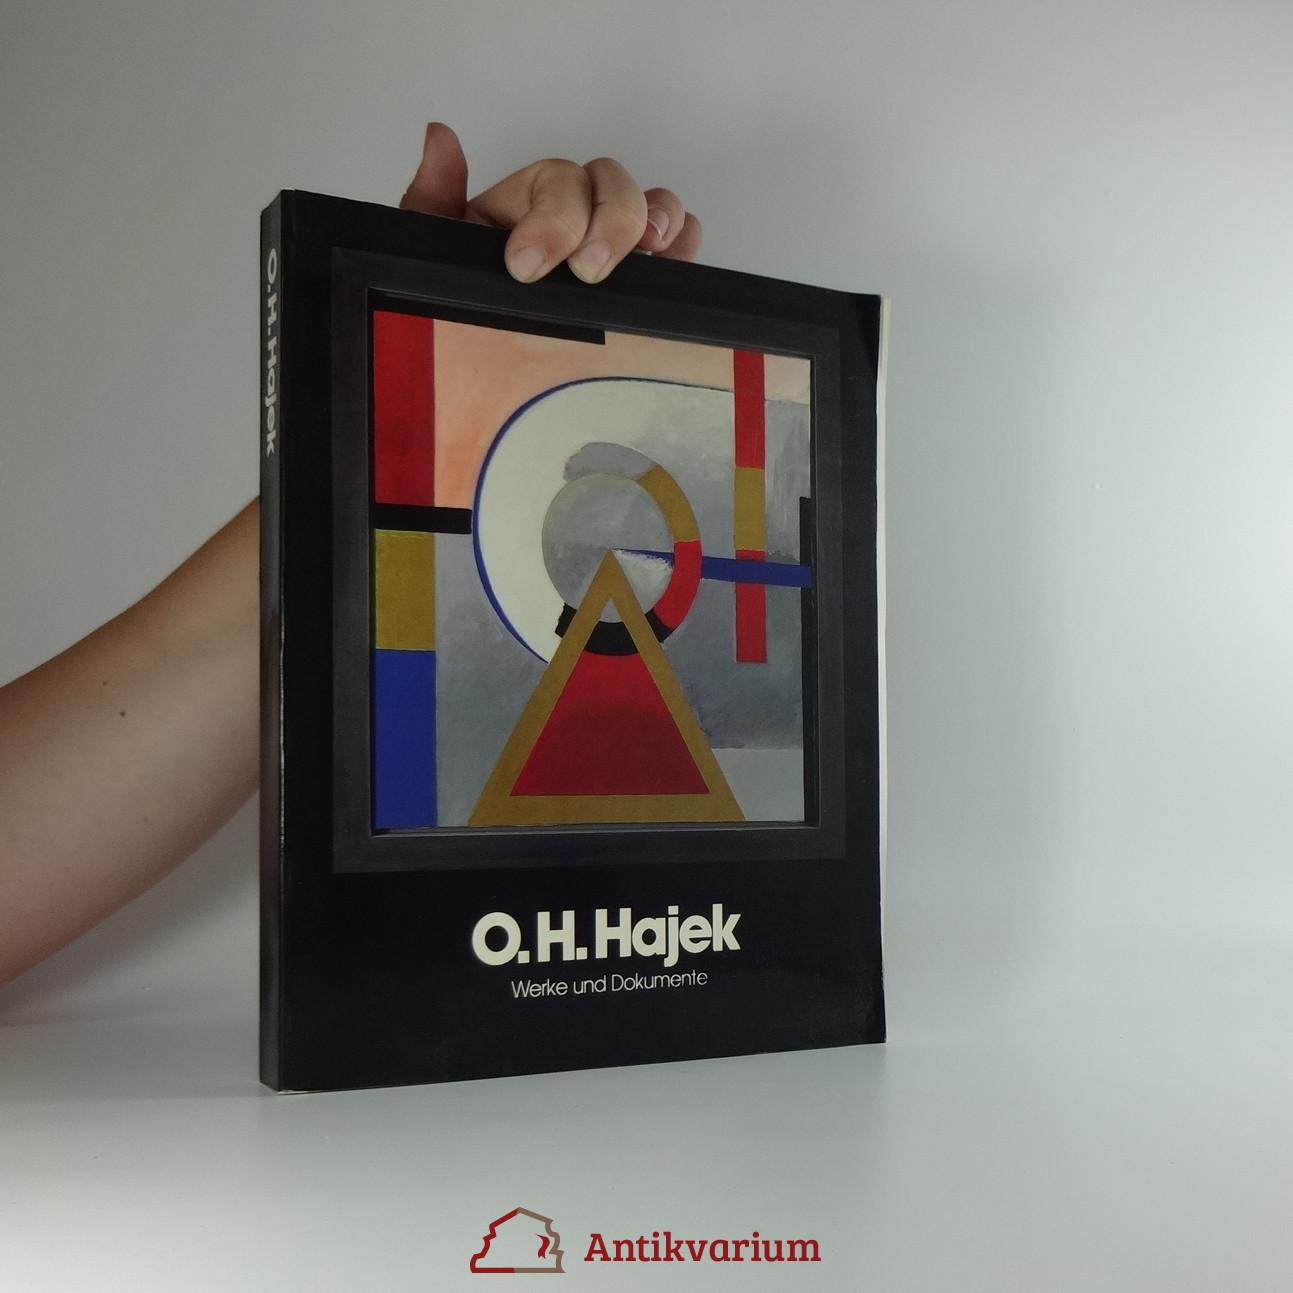 antikvární kniha O.H.Hajek: Werke und Dokumente, 1987